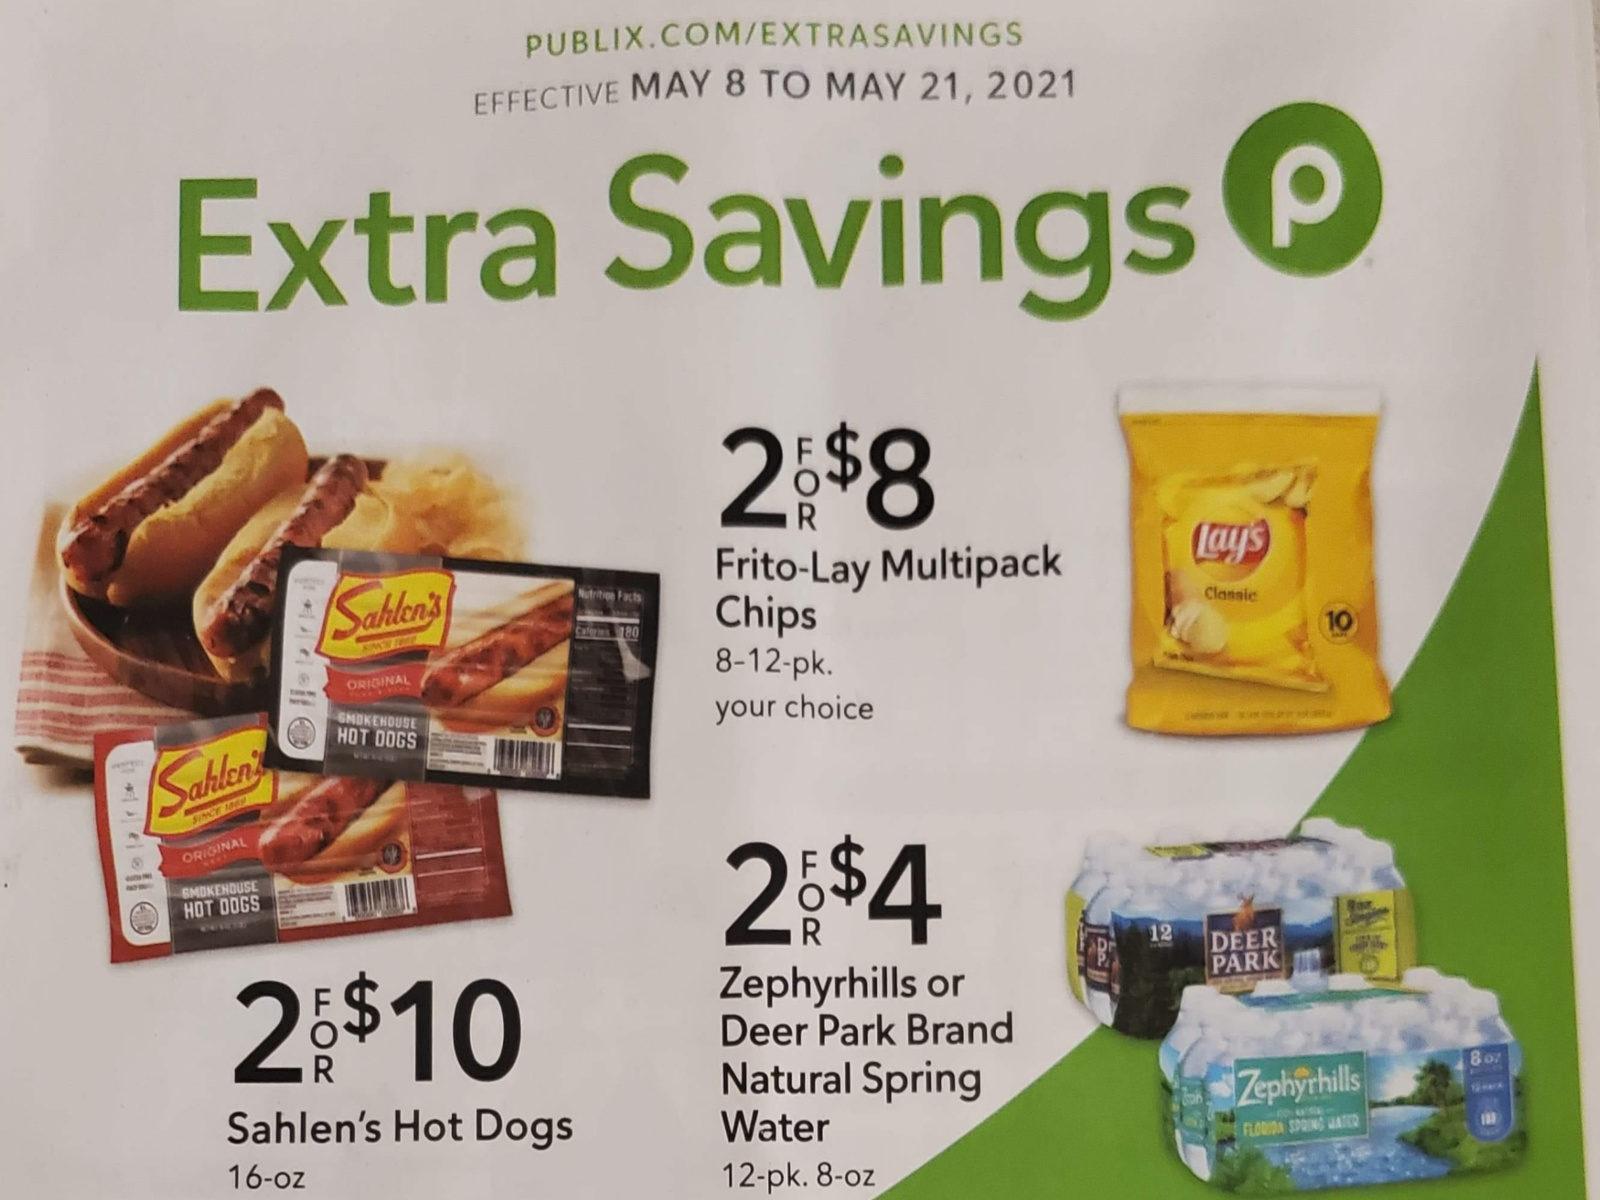 Publix Extra Savings Flyer, 5/8 to 5/21 on I Heart Publix